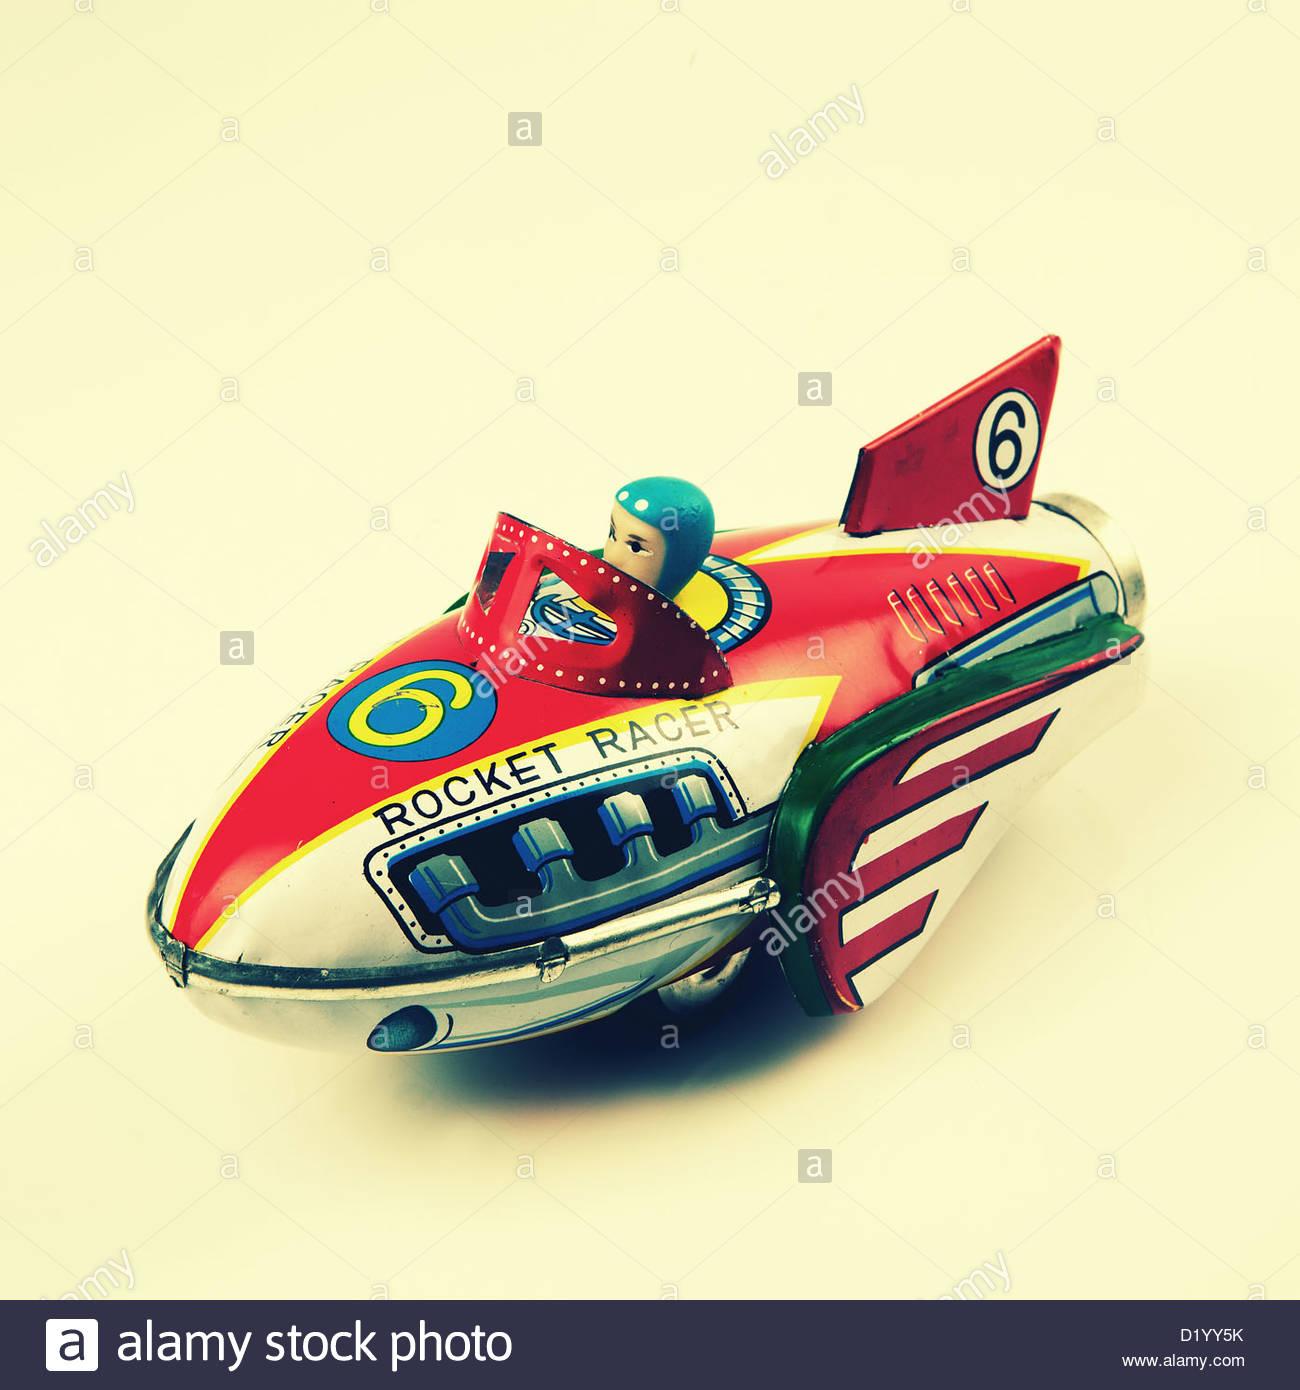 Plaque étain rocket racer toy Photo Stock